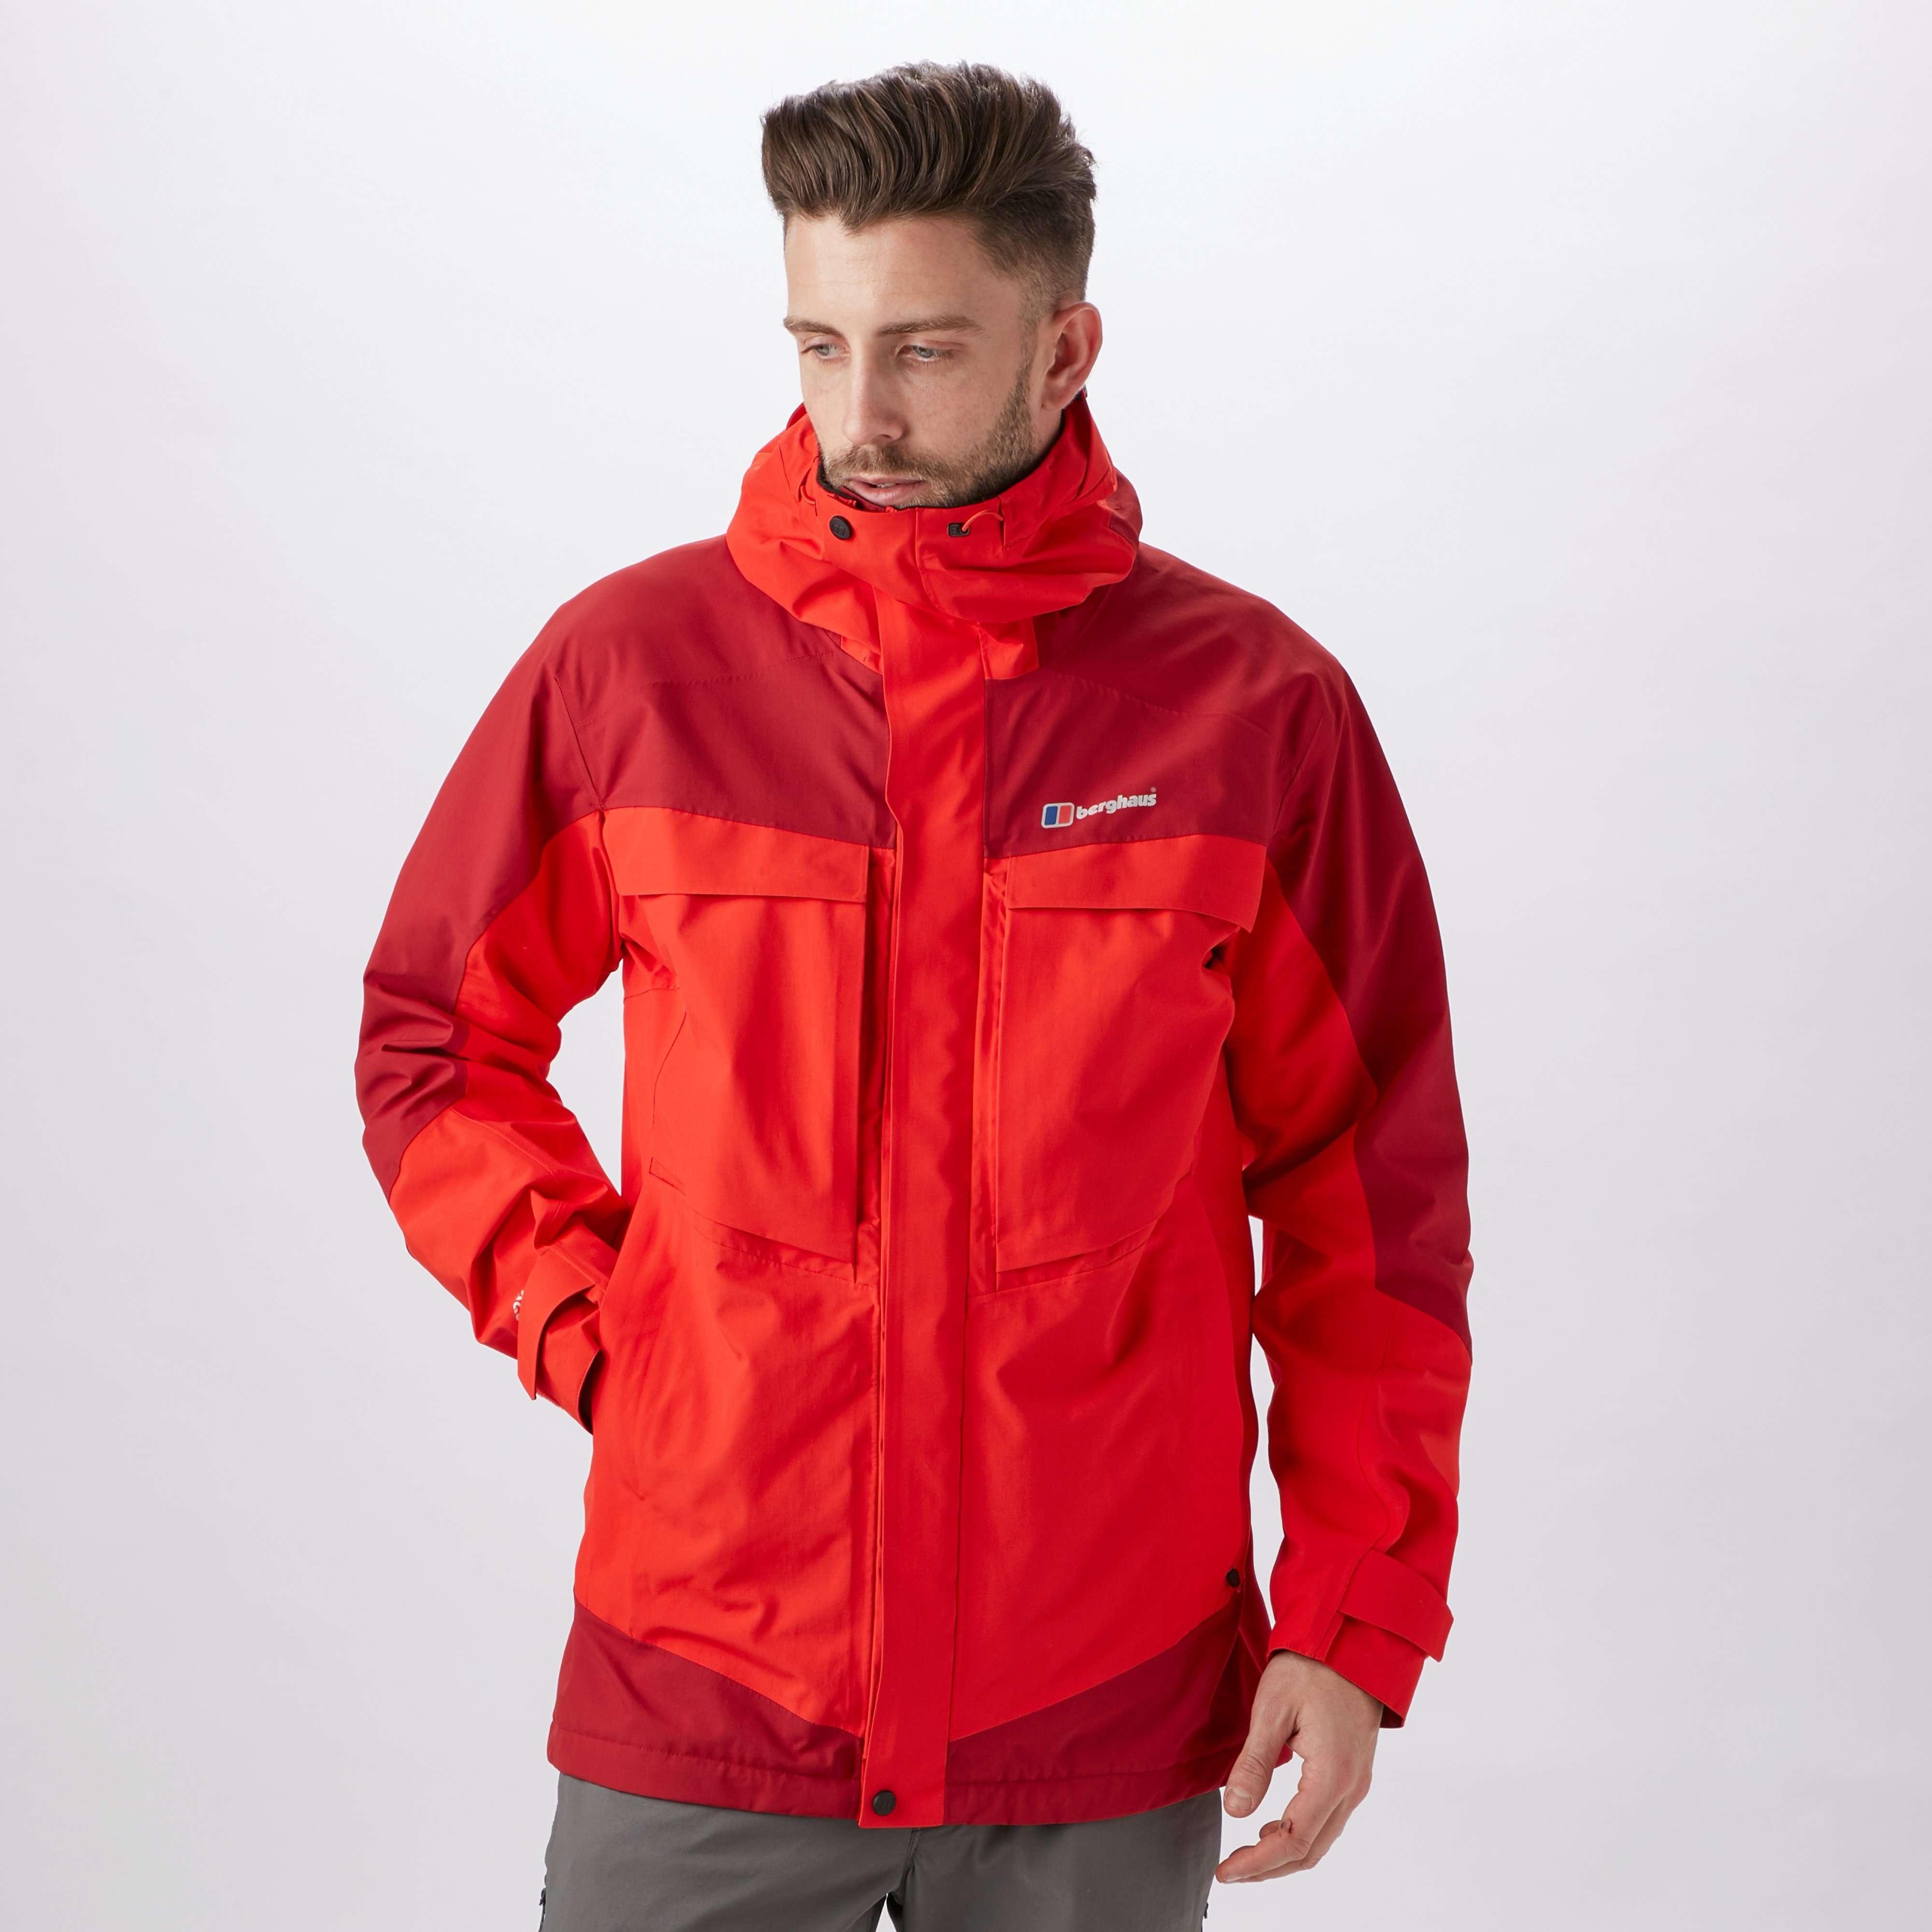 BERGHAUS Men's Mera Peak 5.0 GORE-TEX® Jacket